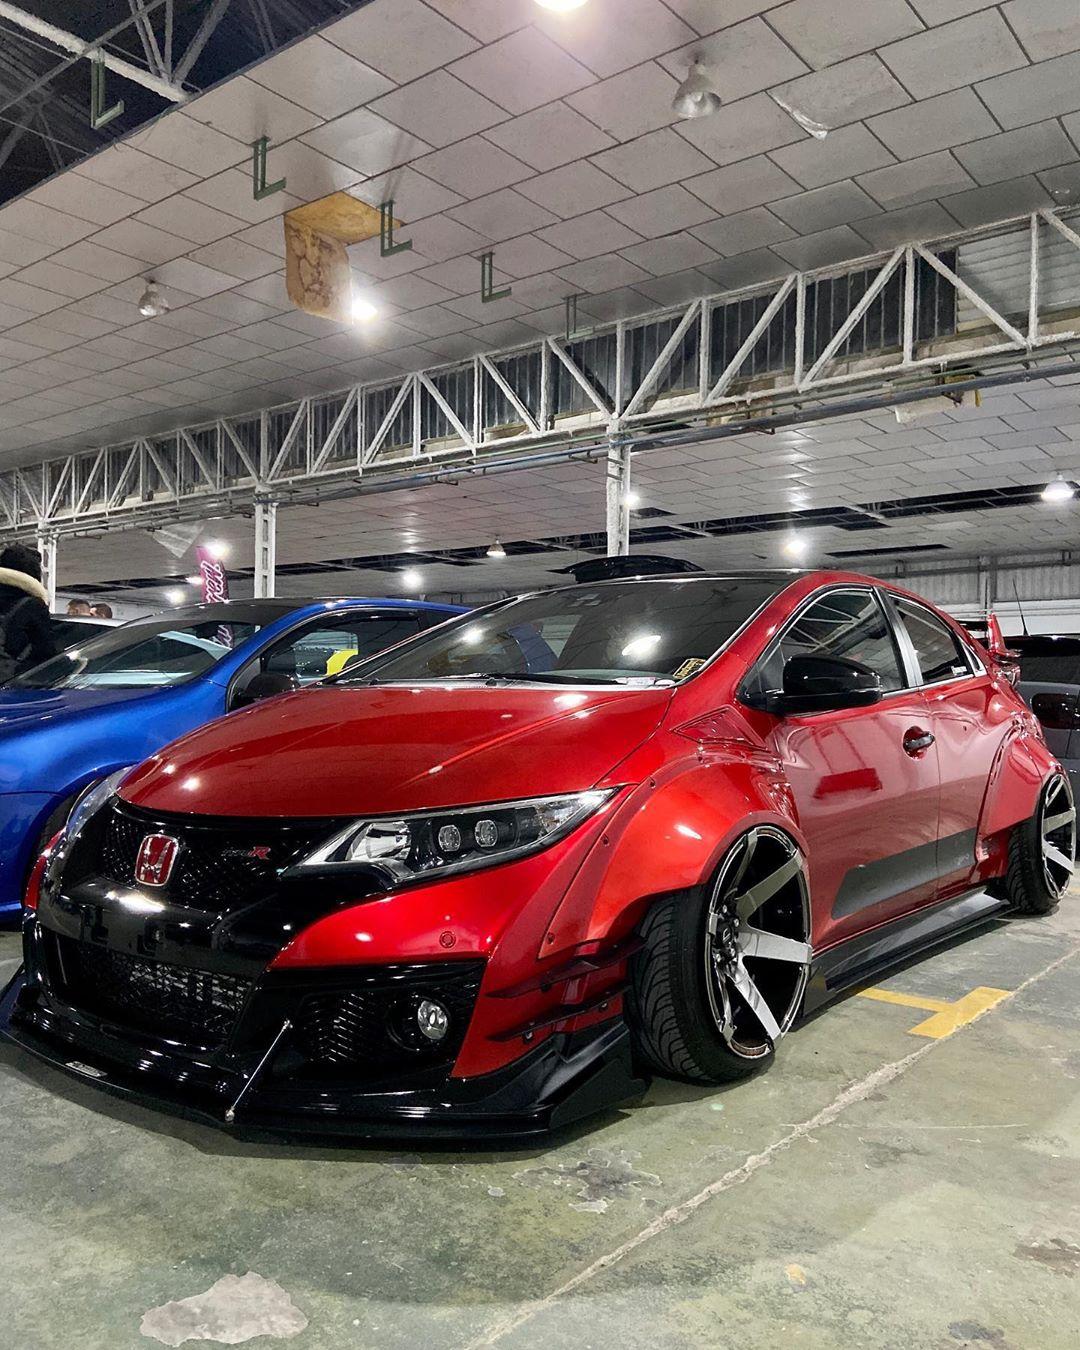 Honda_Civic_Type_R_Rocket_Bunny_bodykit_0003